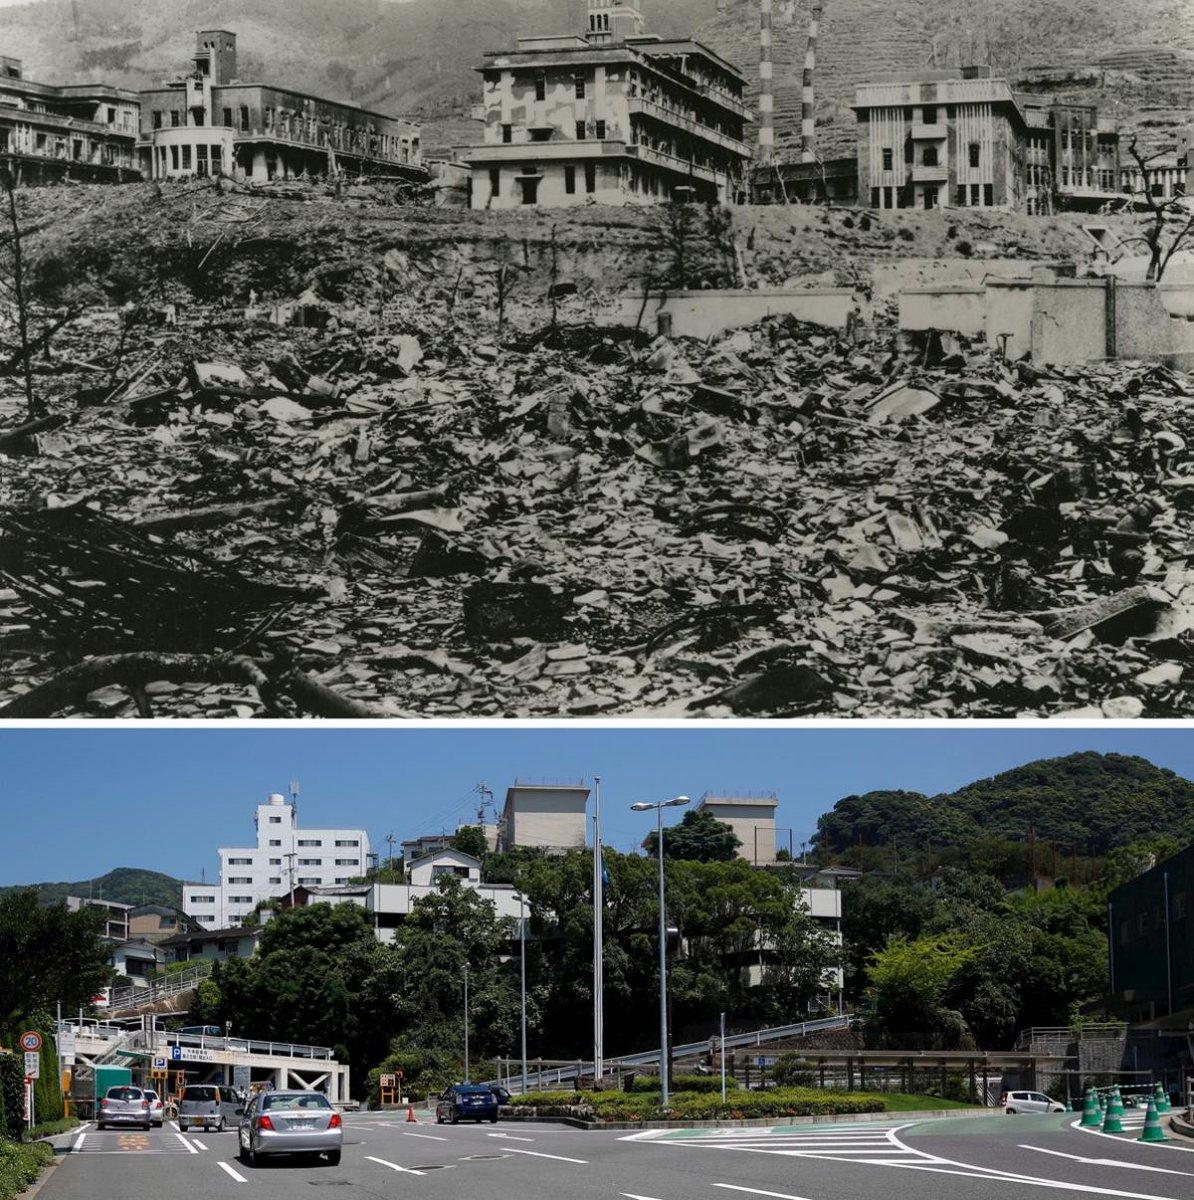 Хиросима и нагасаки фото в настоящее время